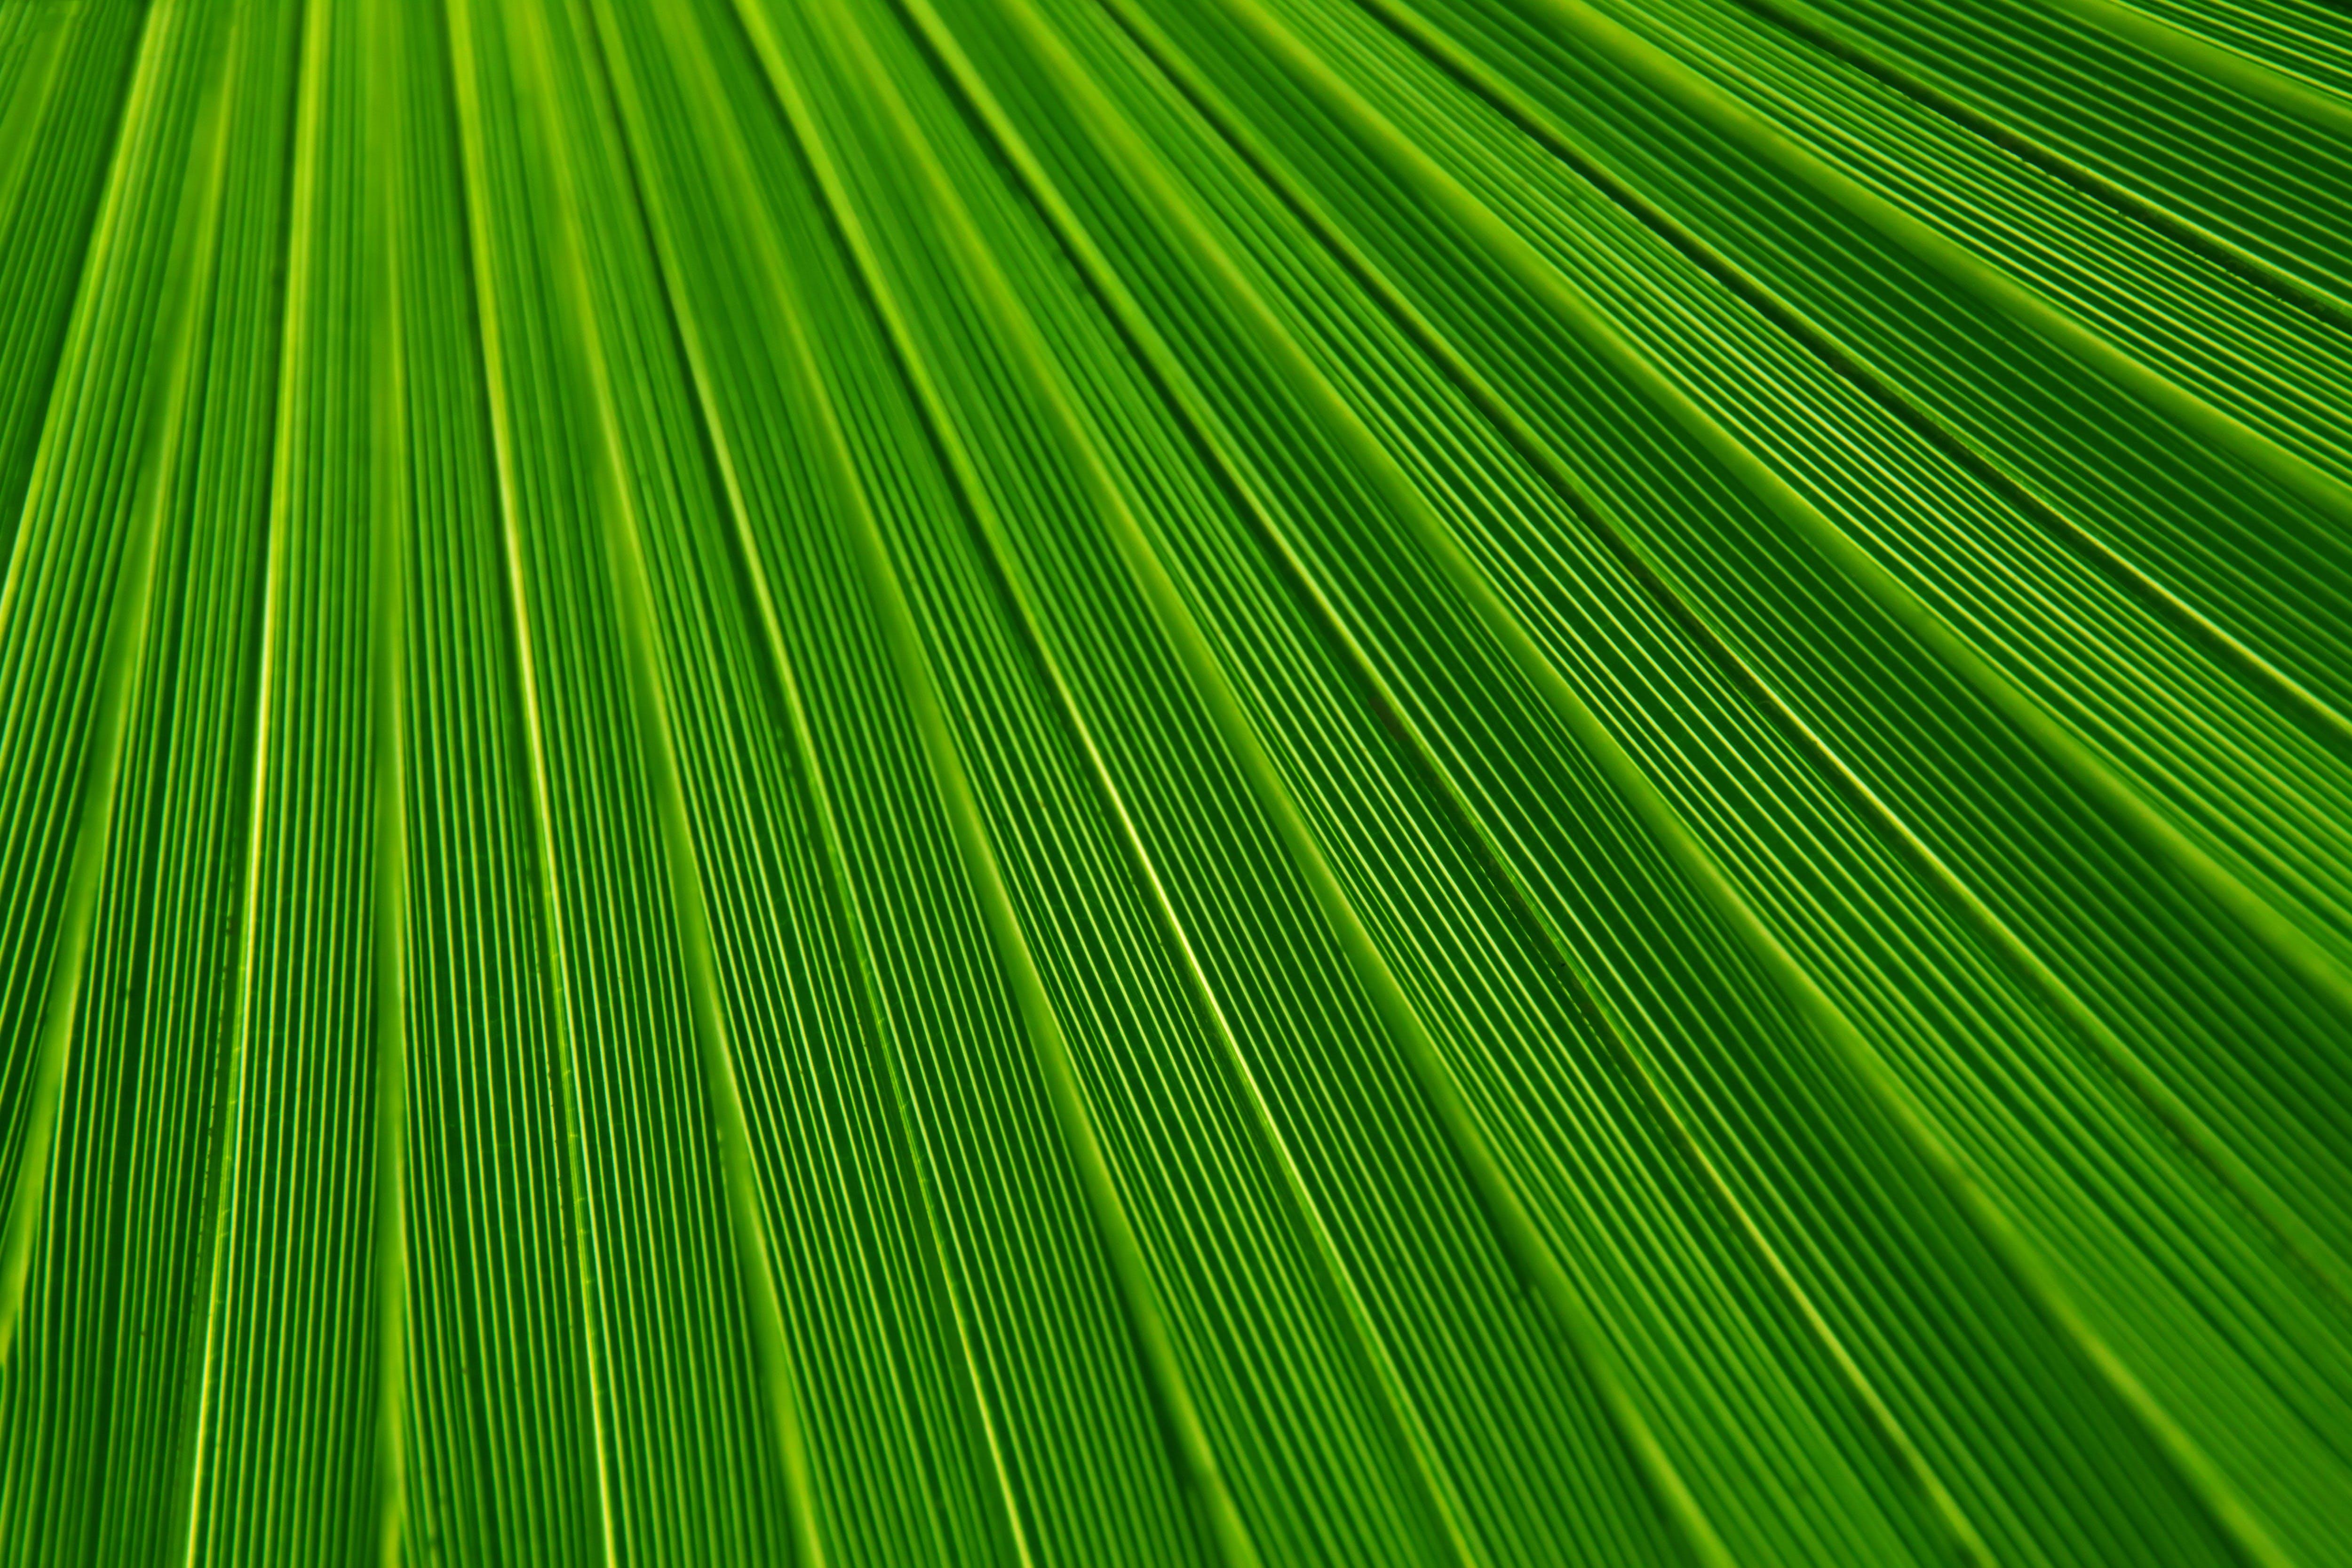 Green Line Illustration